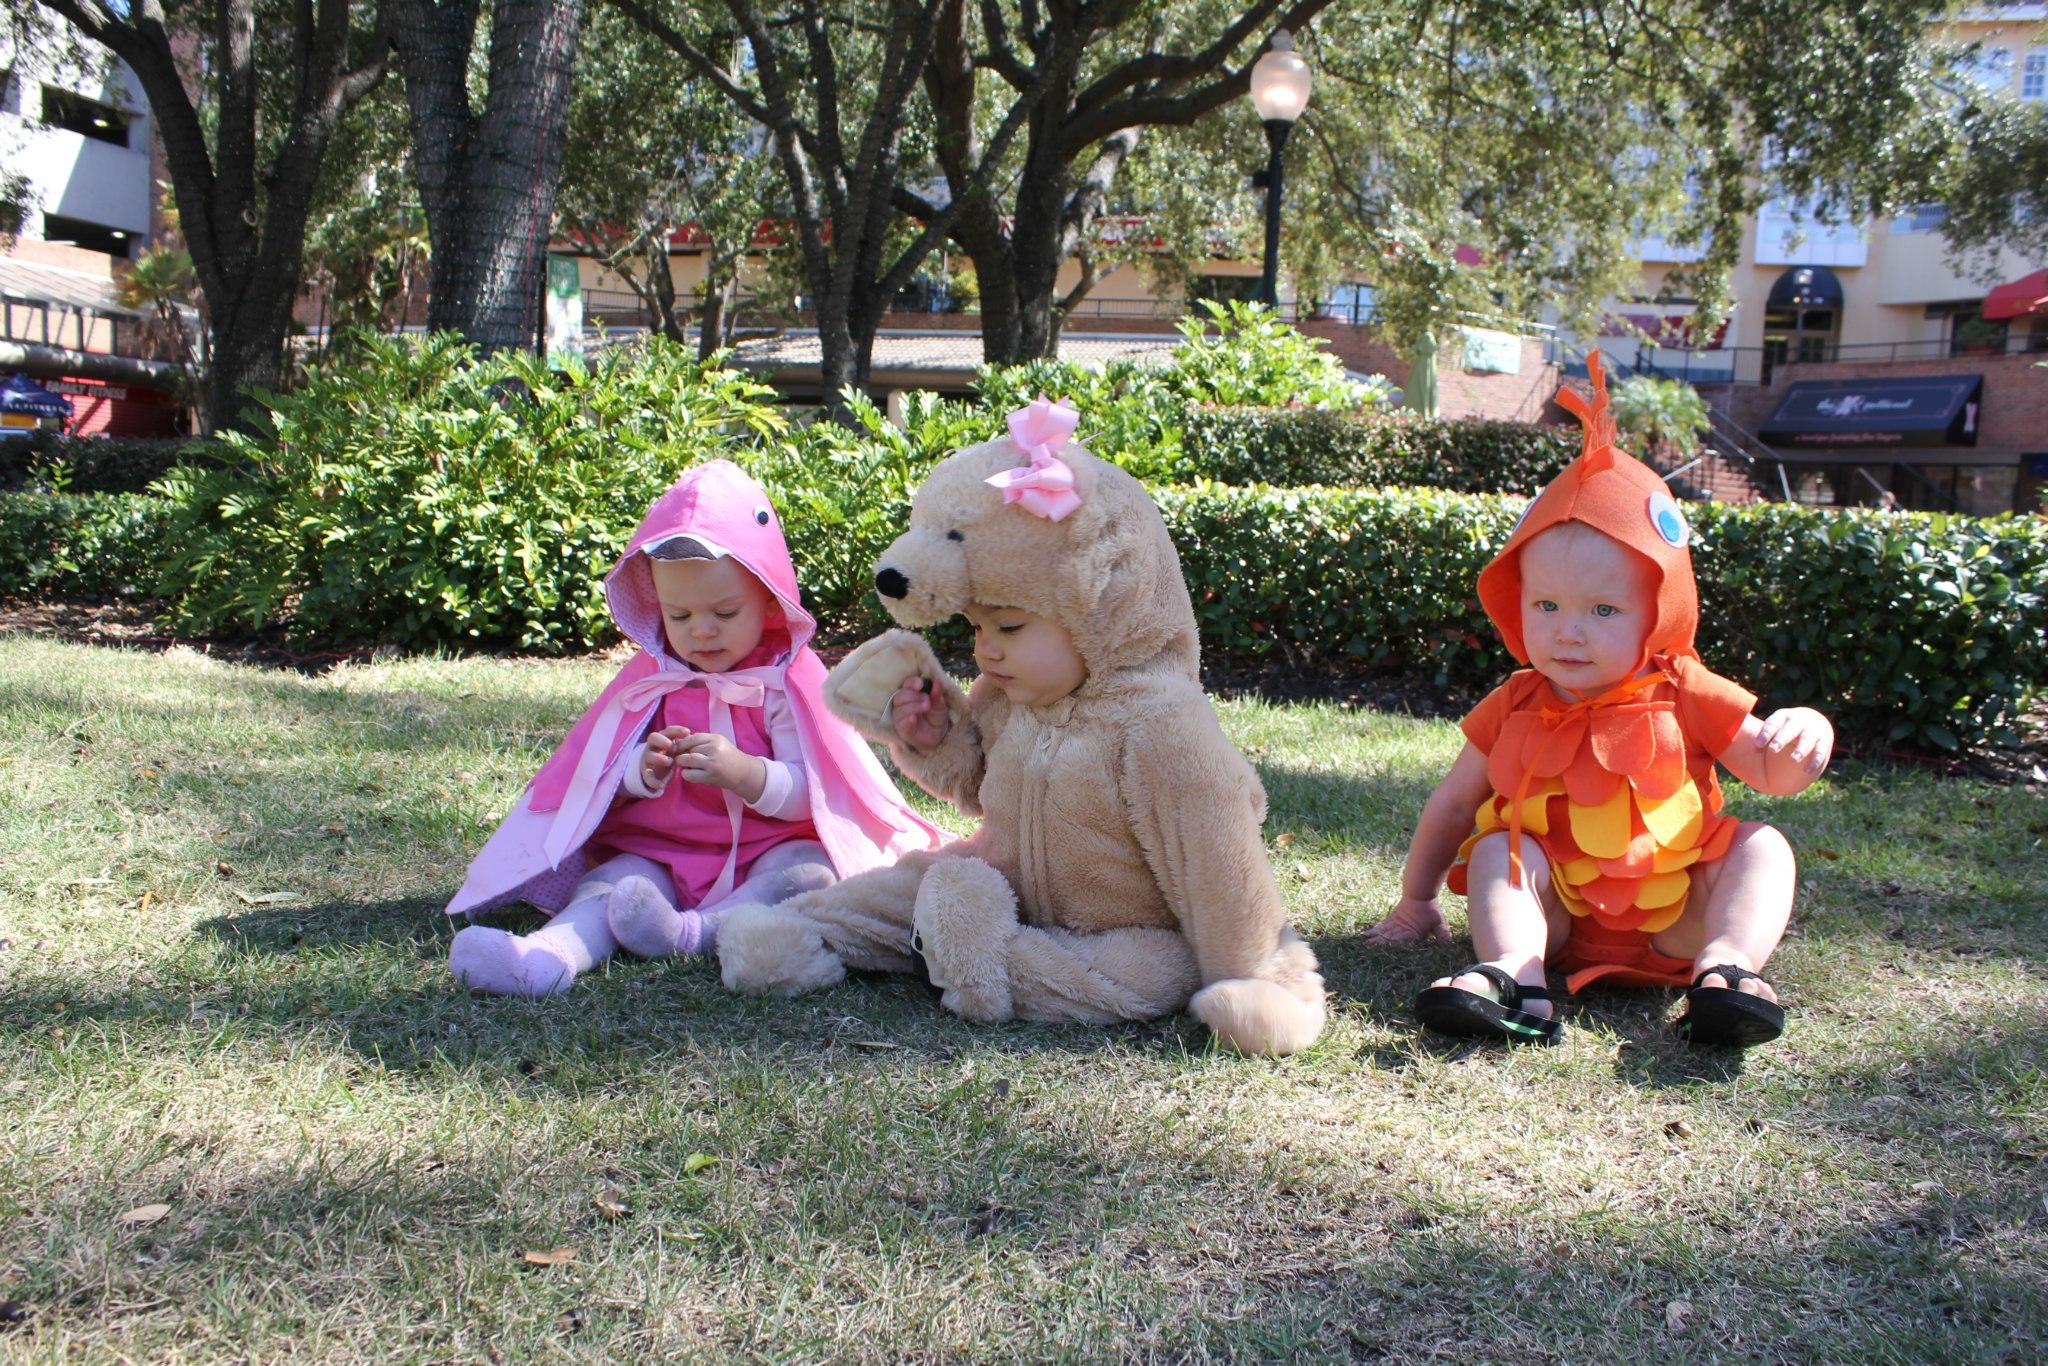 Less-Than-$7 DIY Family Fish Halloween Costume Idea SheJustGlows.com